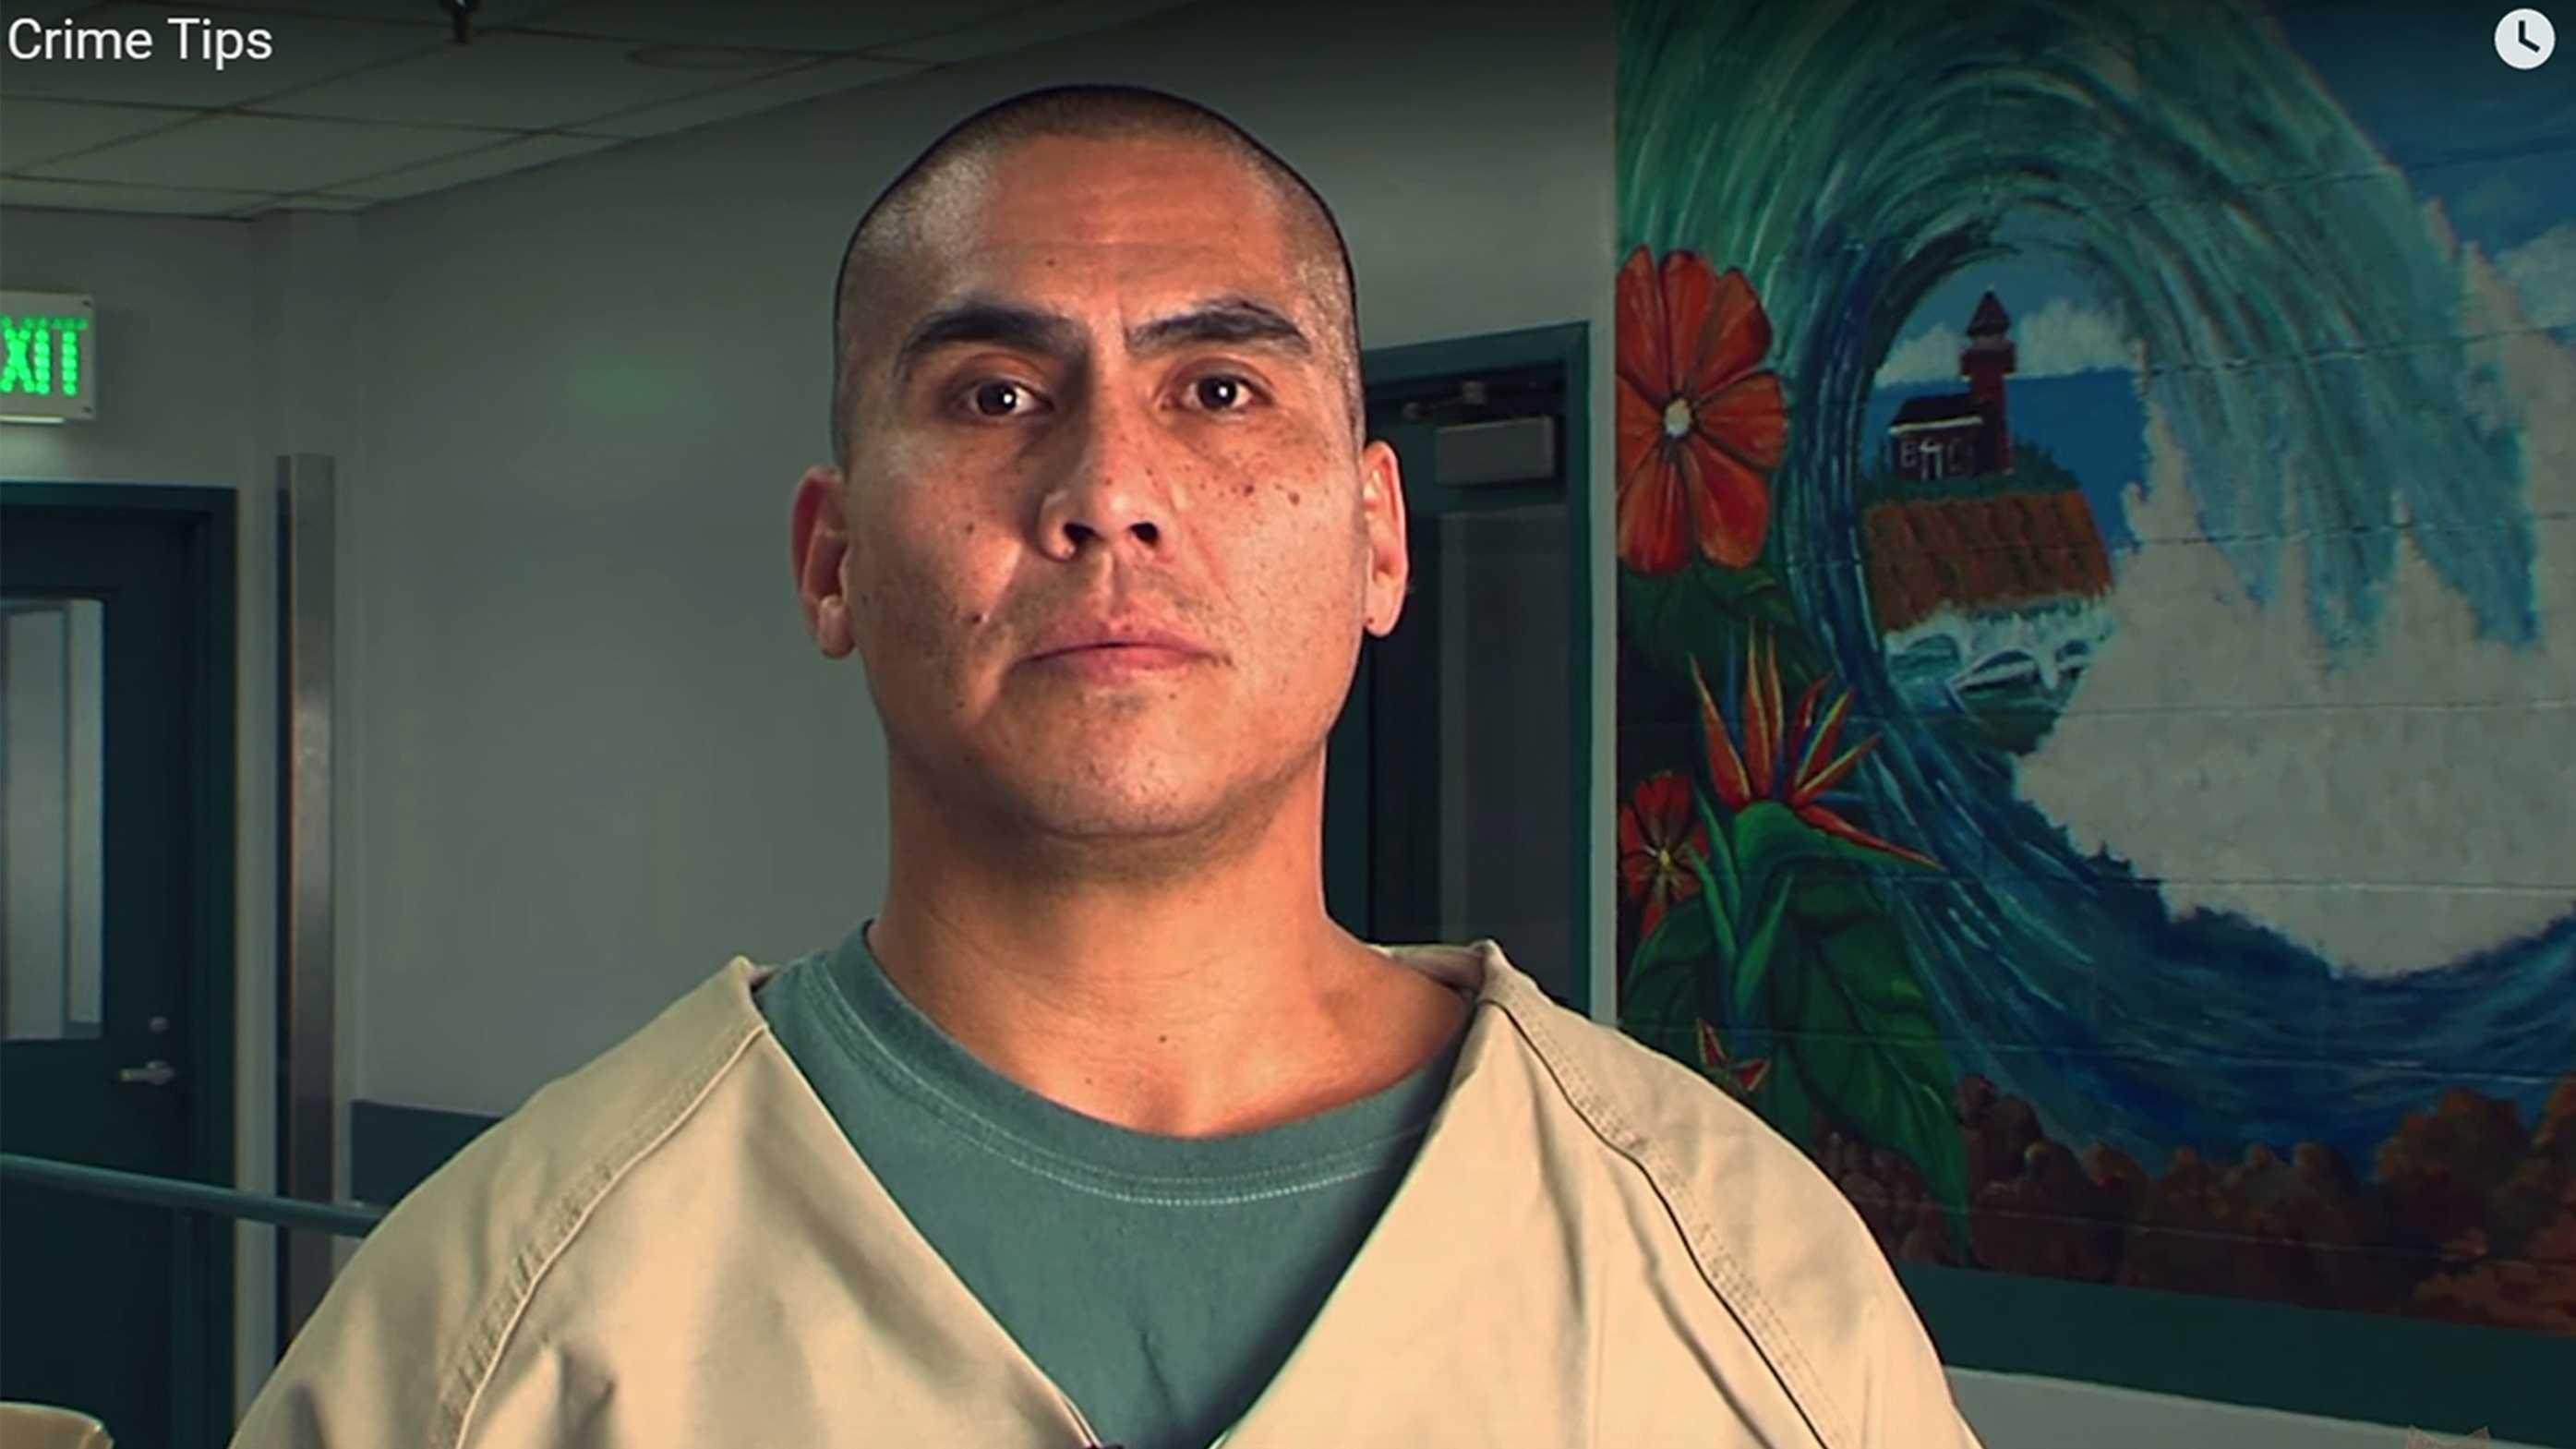 Crime tips from Santa Cruz jail